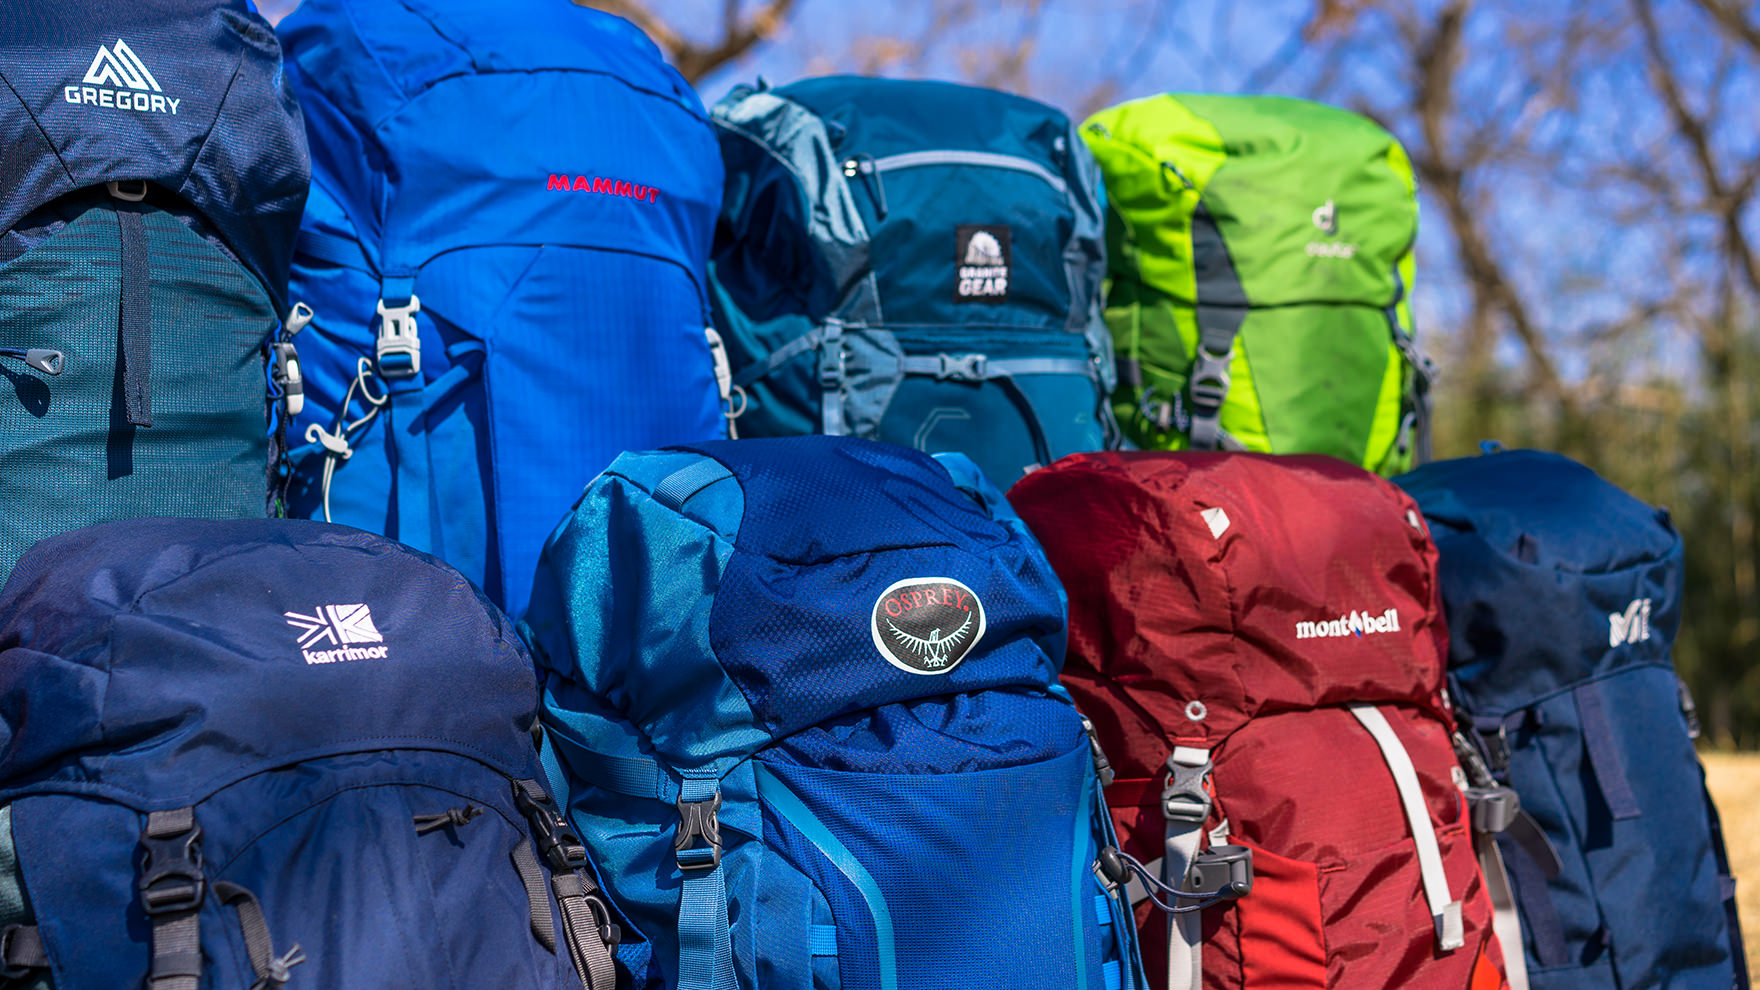 d15ee11d2948 比較レビュー:これから登山をはじめる人に最適な入門バックパックを比べてみた | Outdoor Gearzine